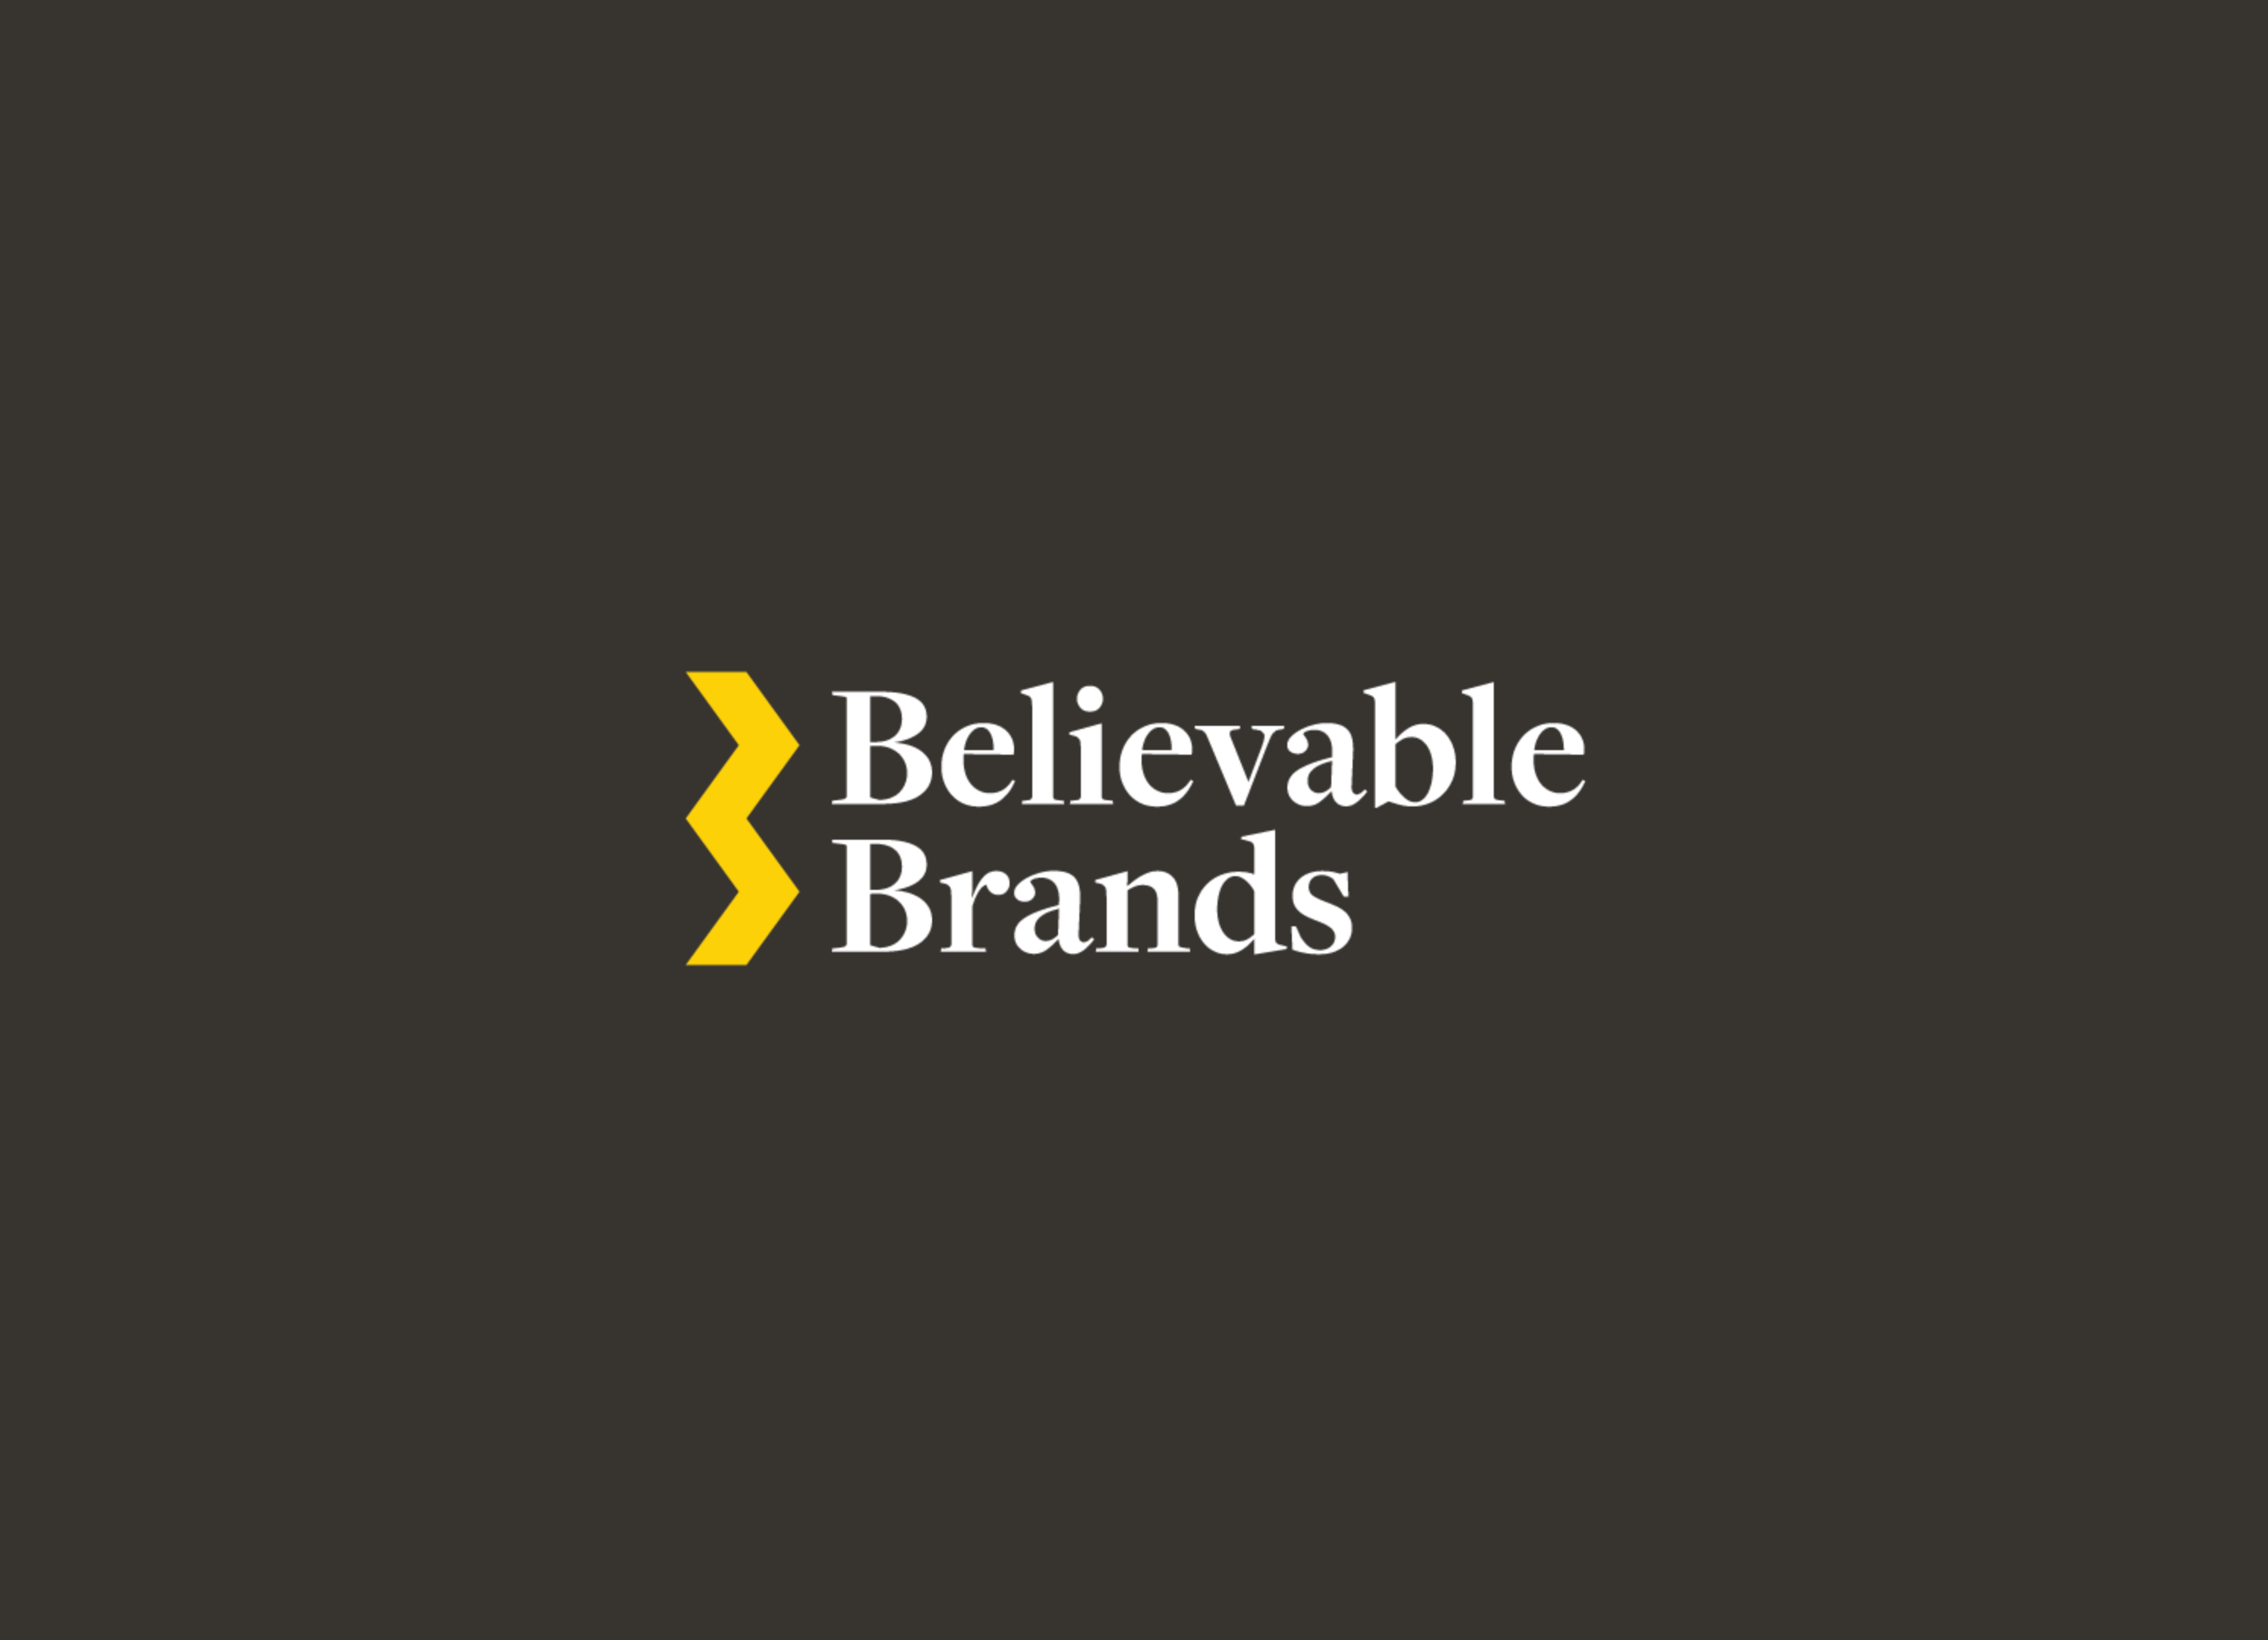 Announcing Believable Brands